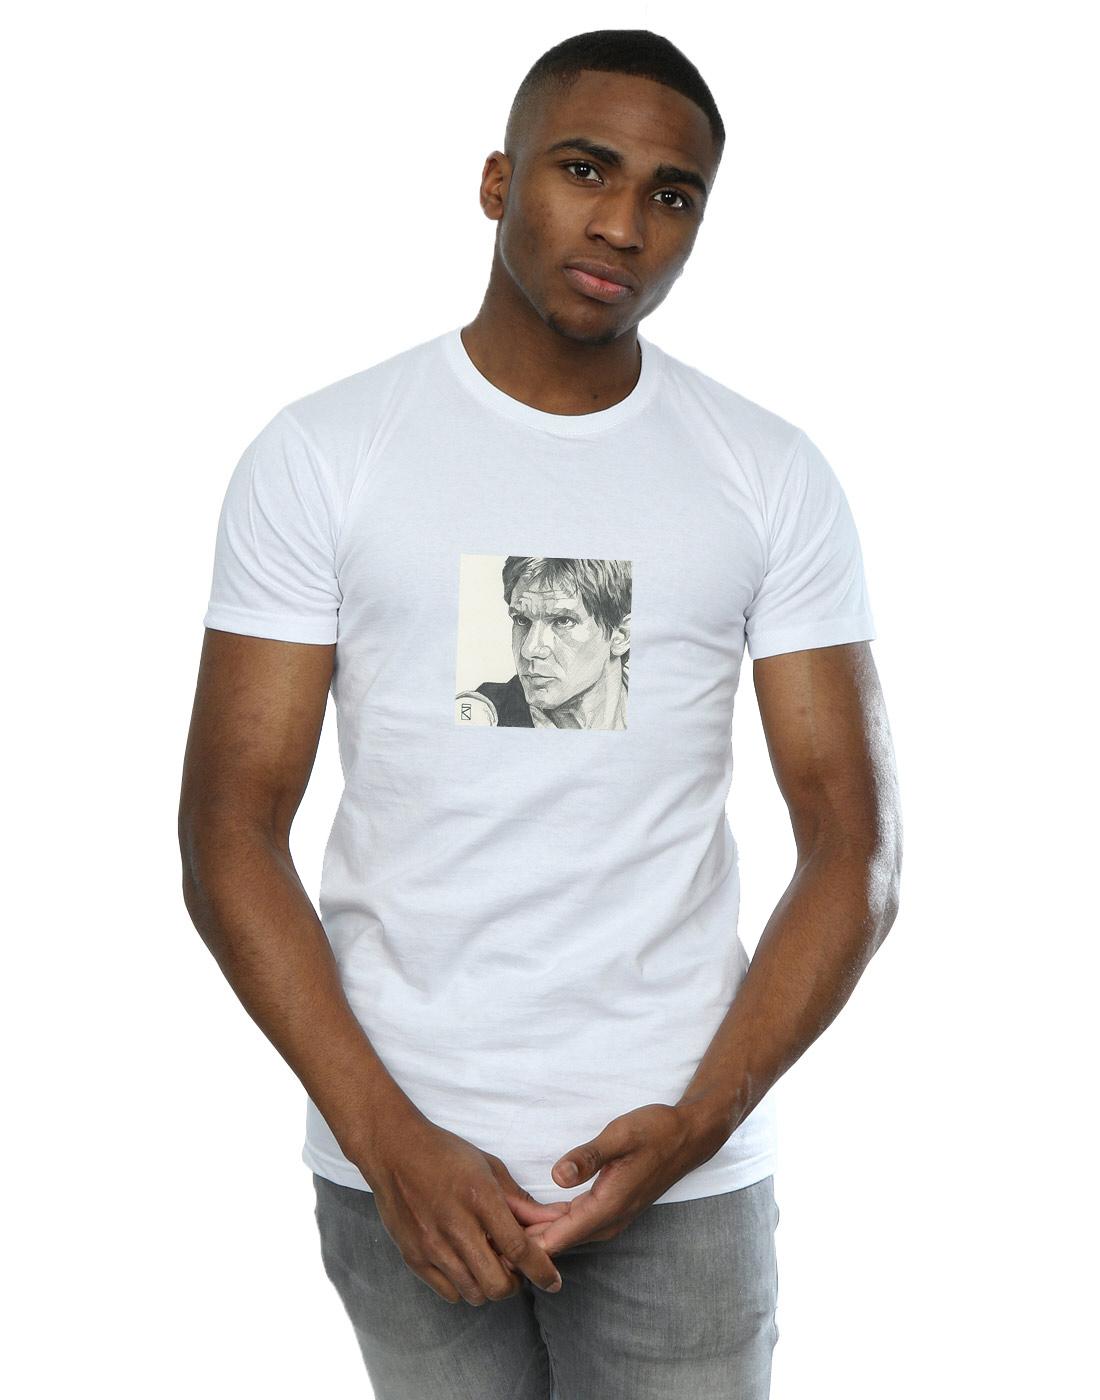 Han-Solo-T-Shirt-Mens-Official-Star-Wars-Merchandise